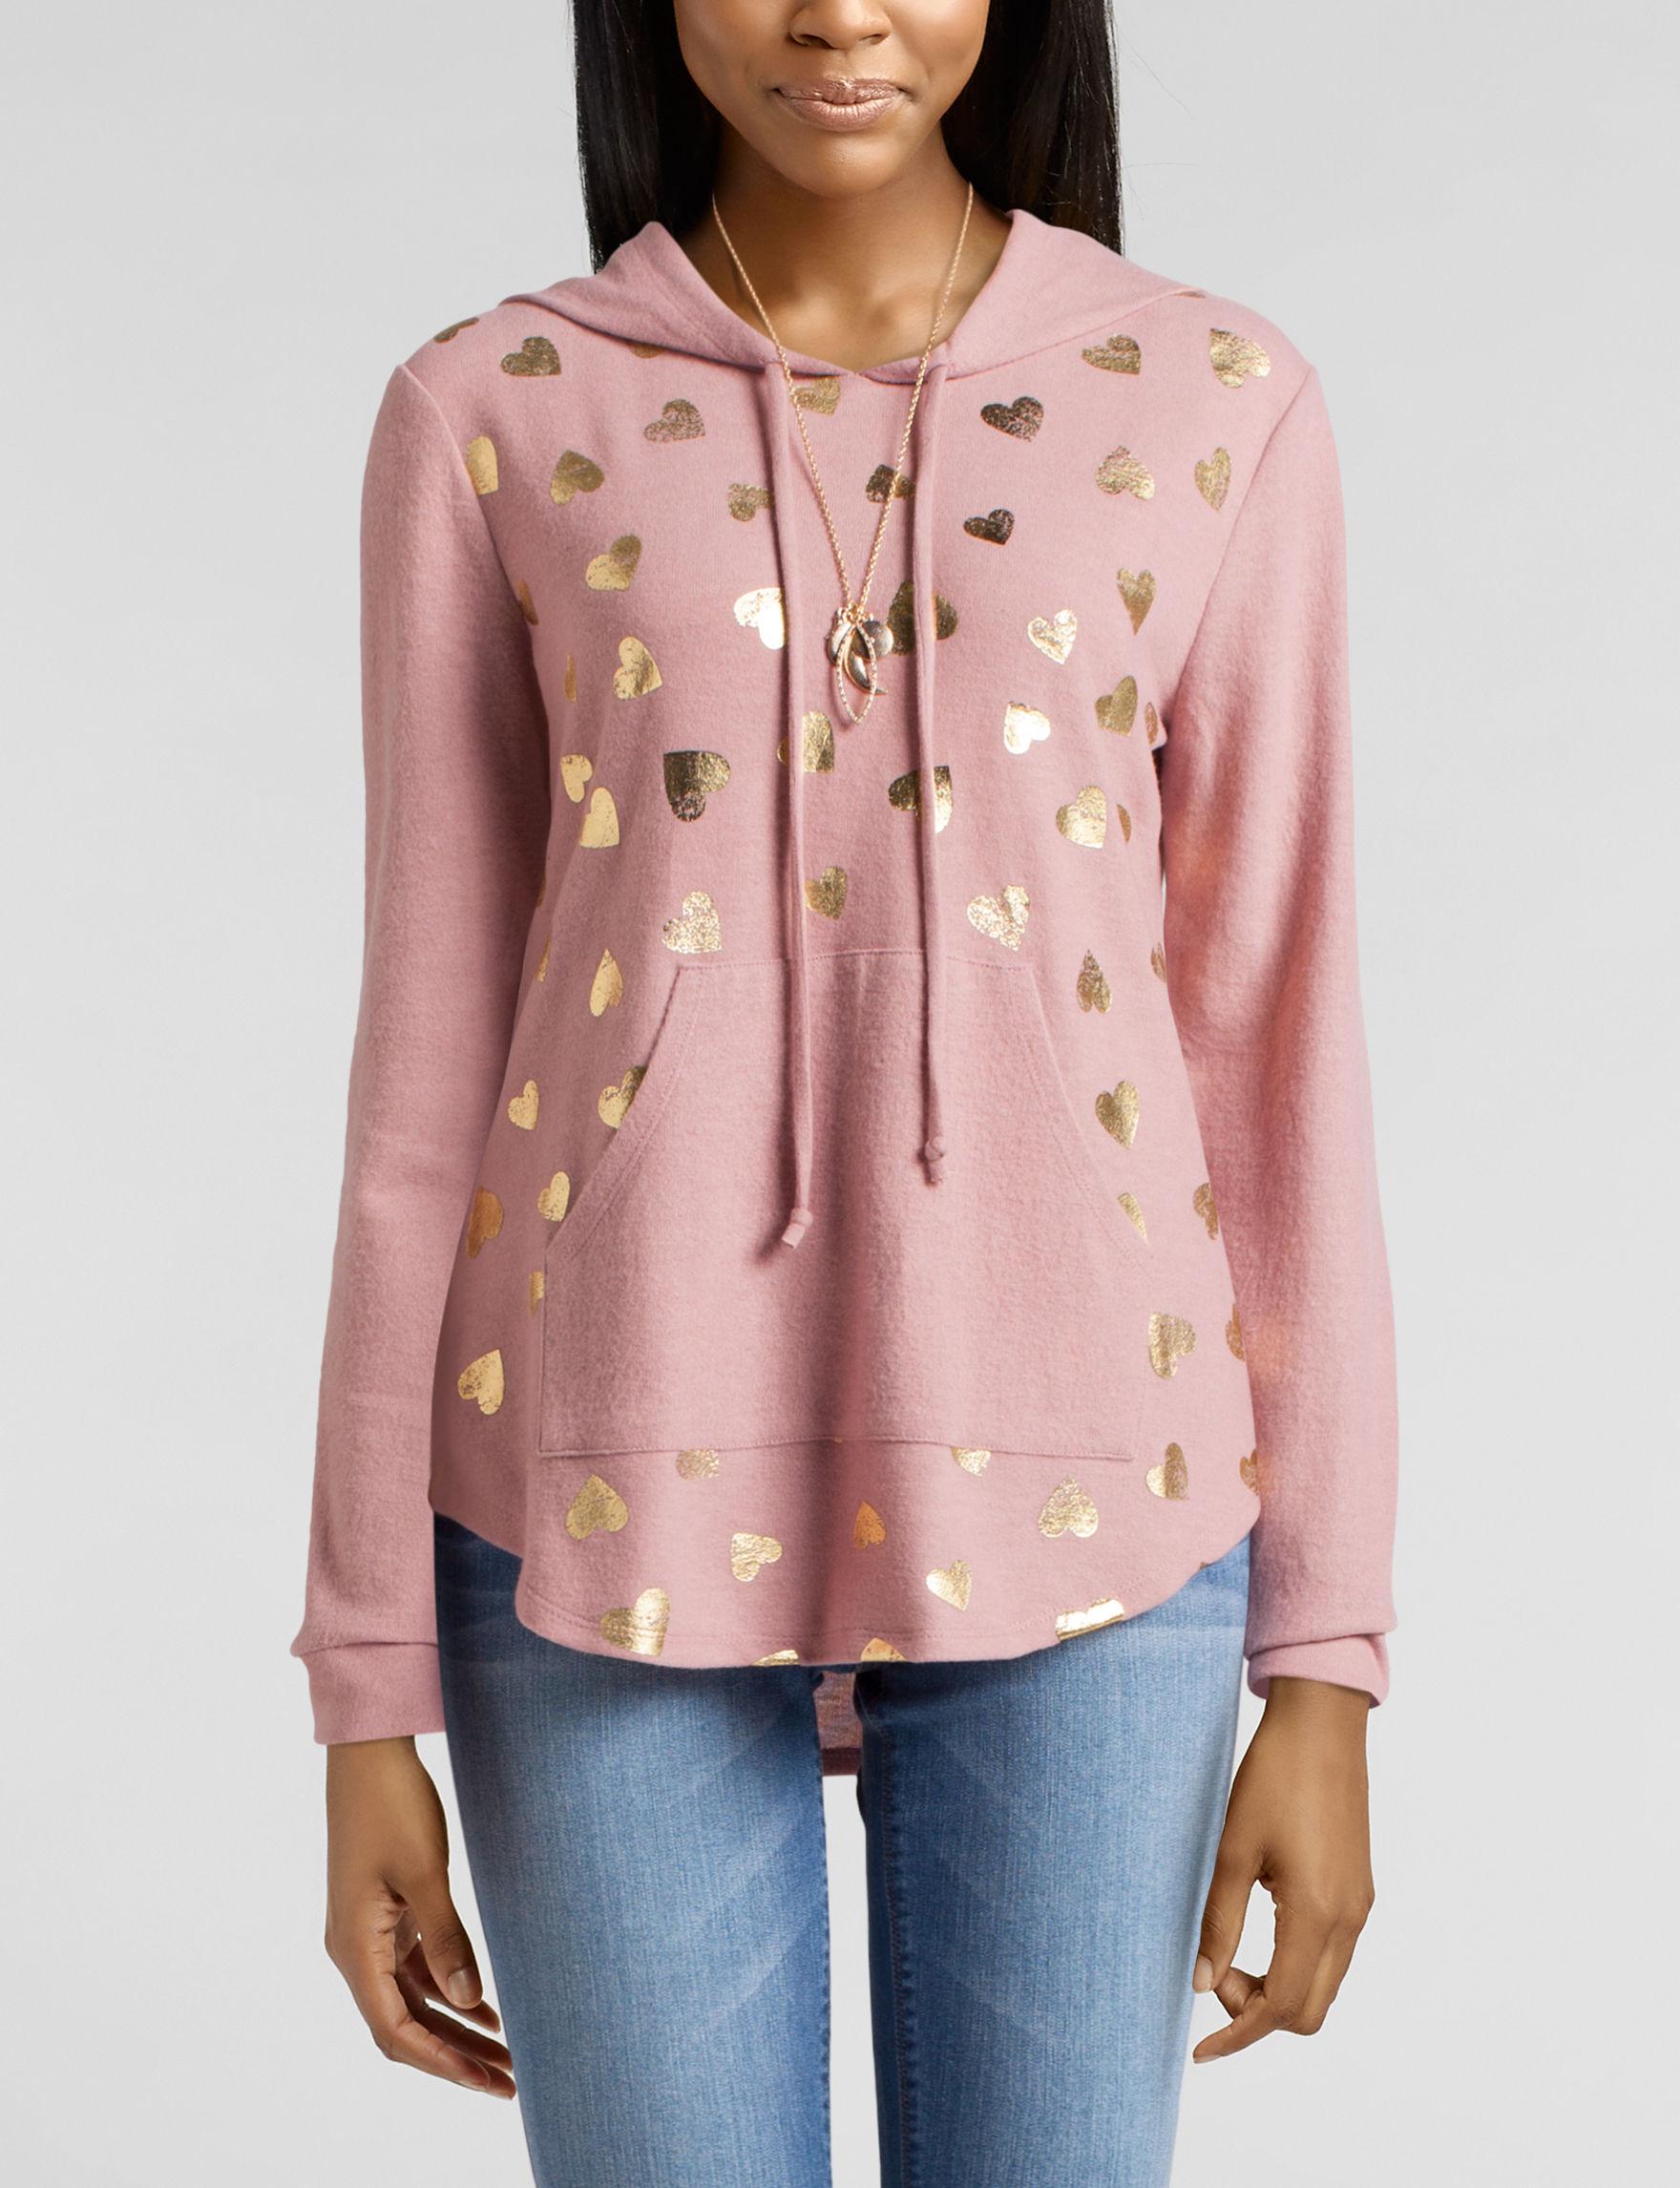 Self Esteem Rose Shirts & Blouses